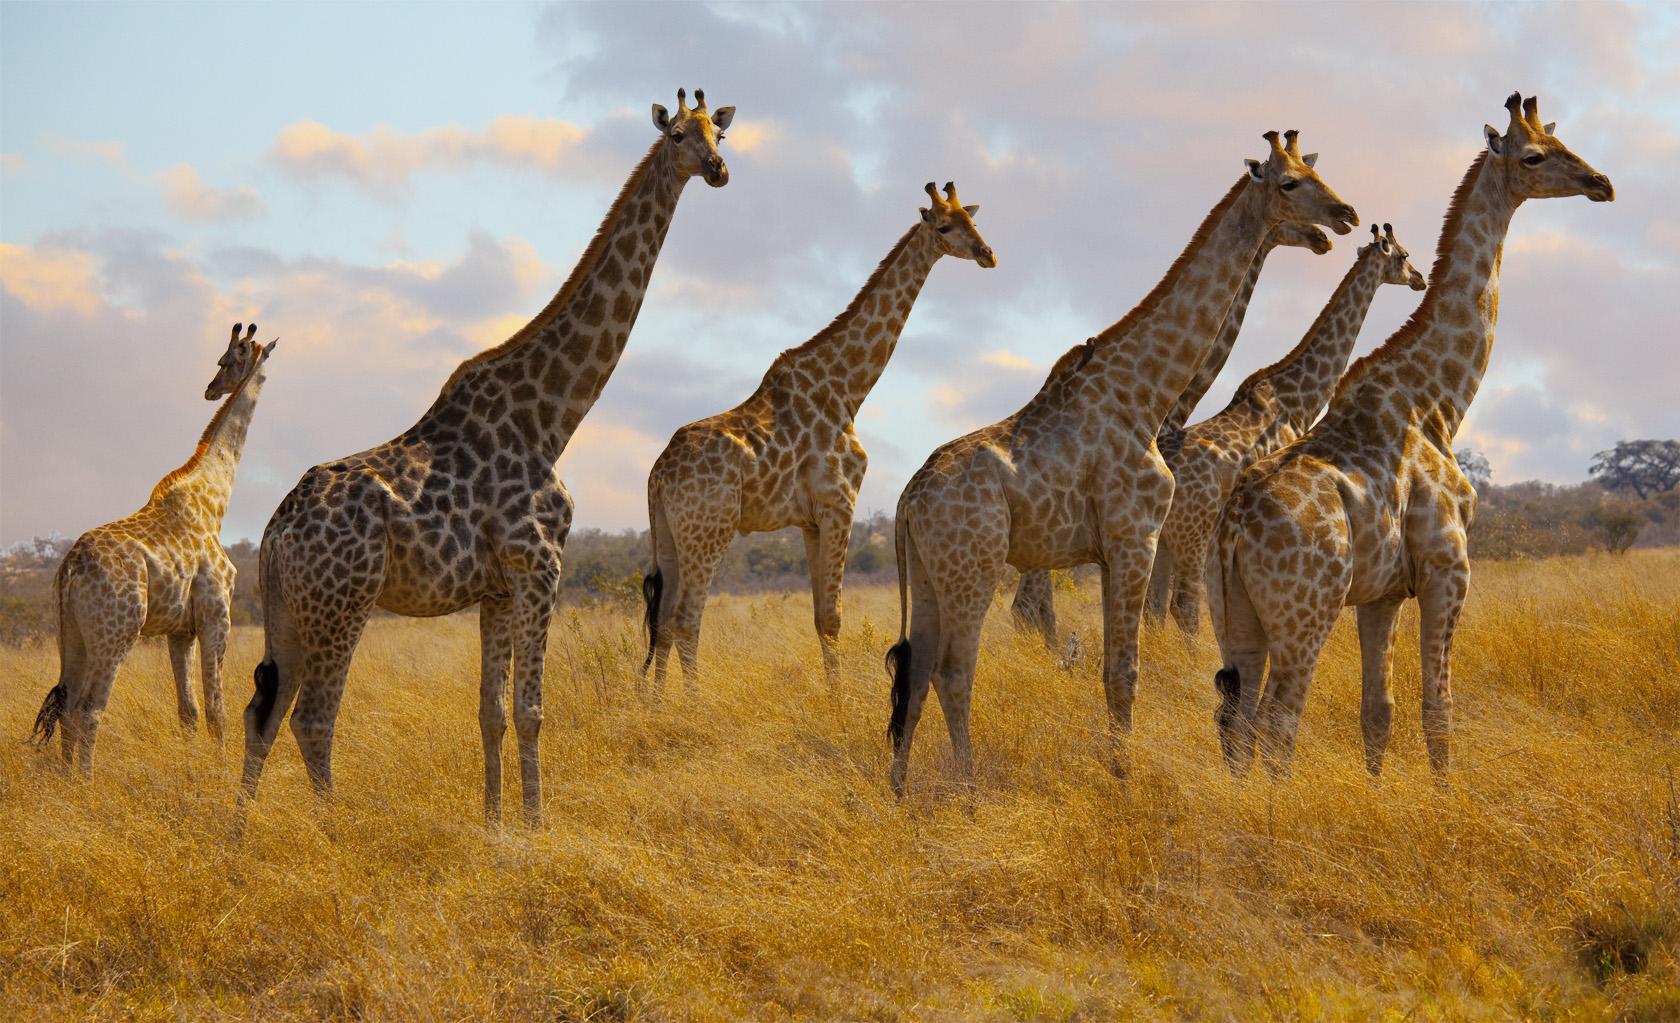 Jirafas de Africa - 1680x1023